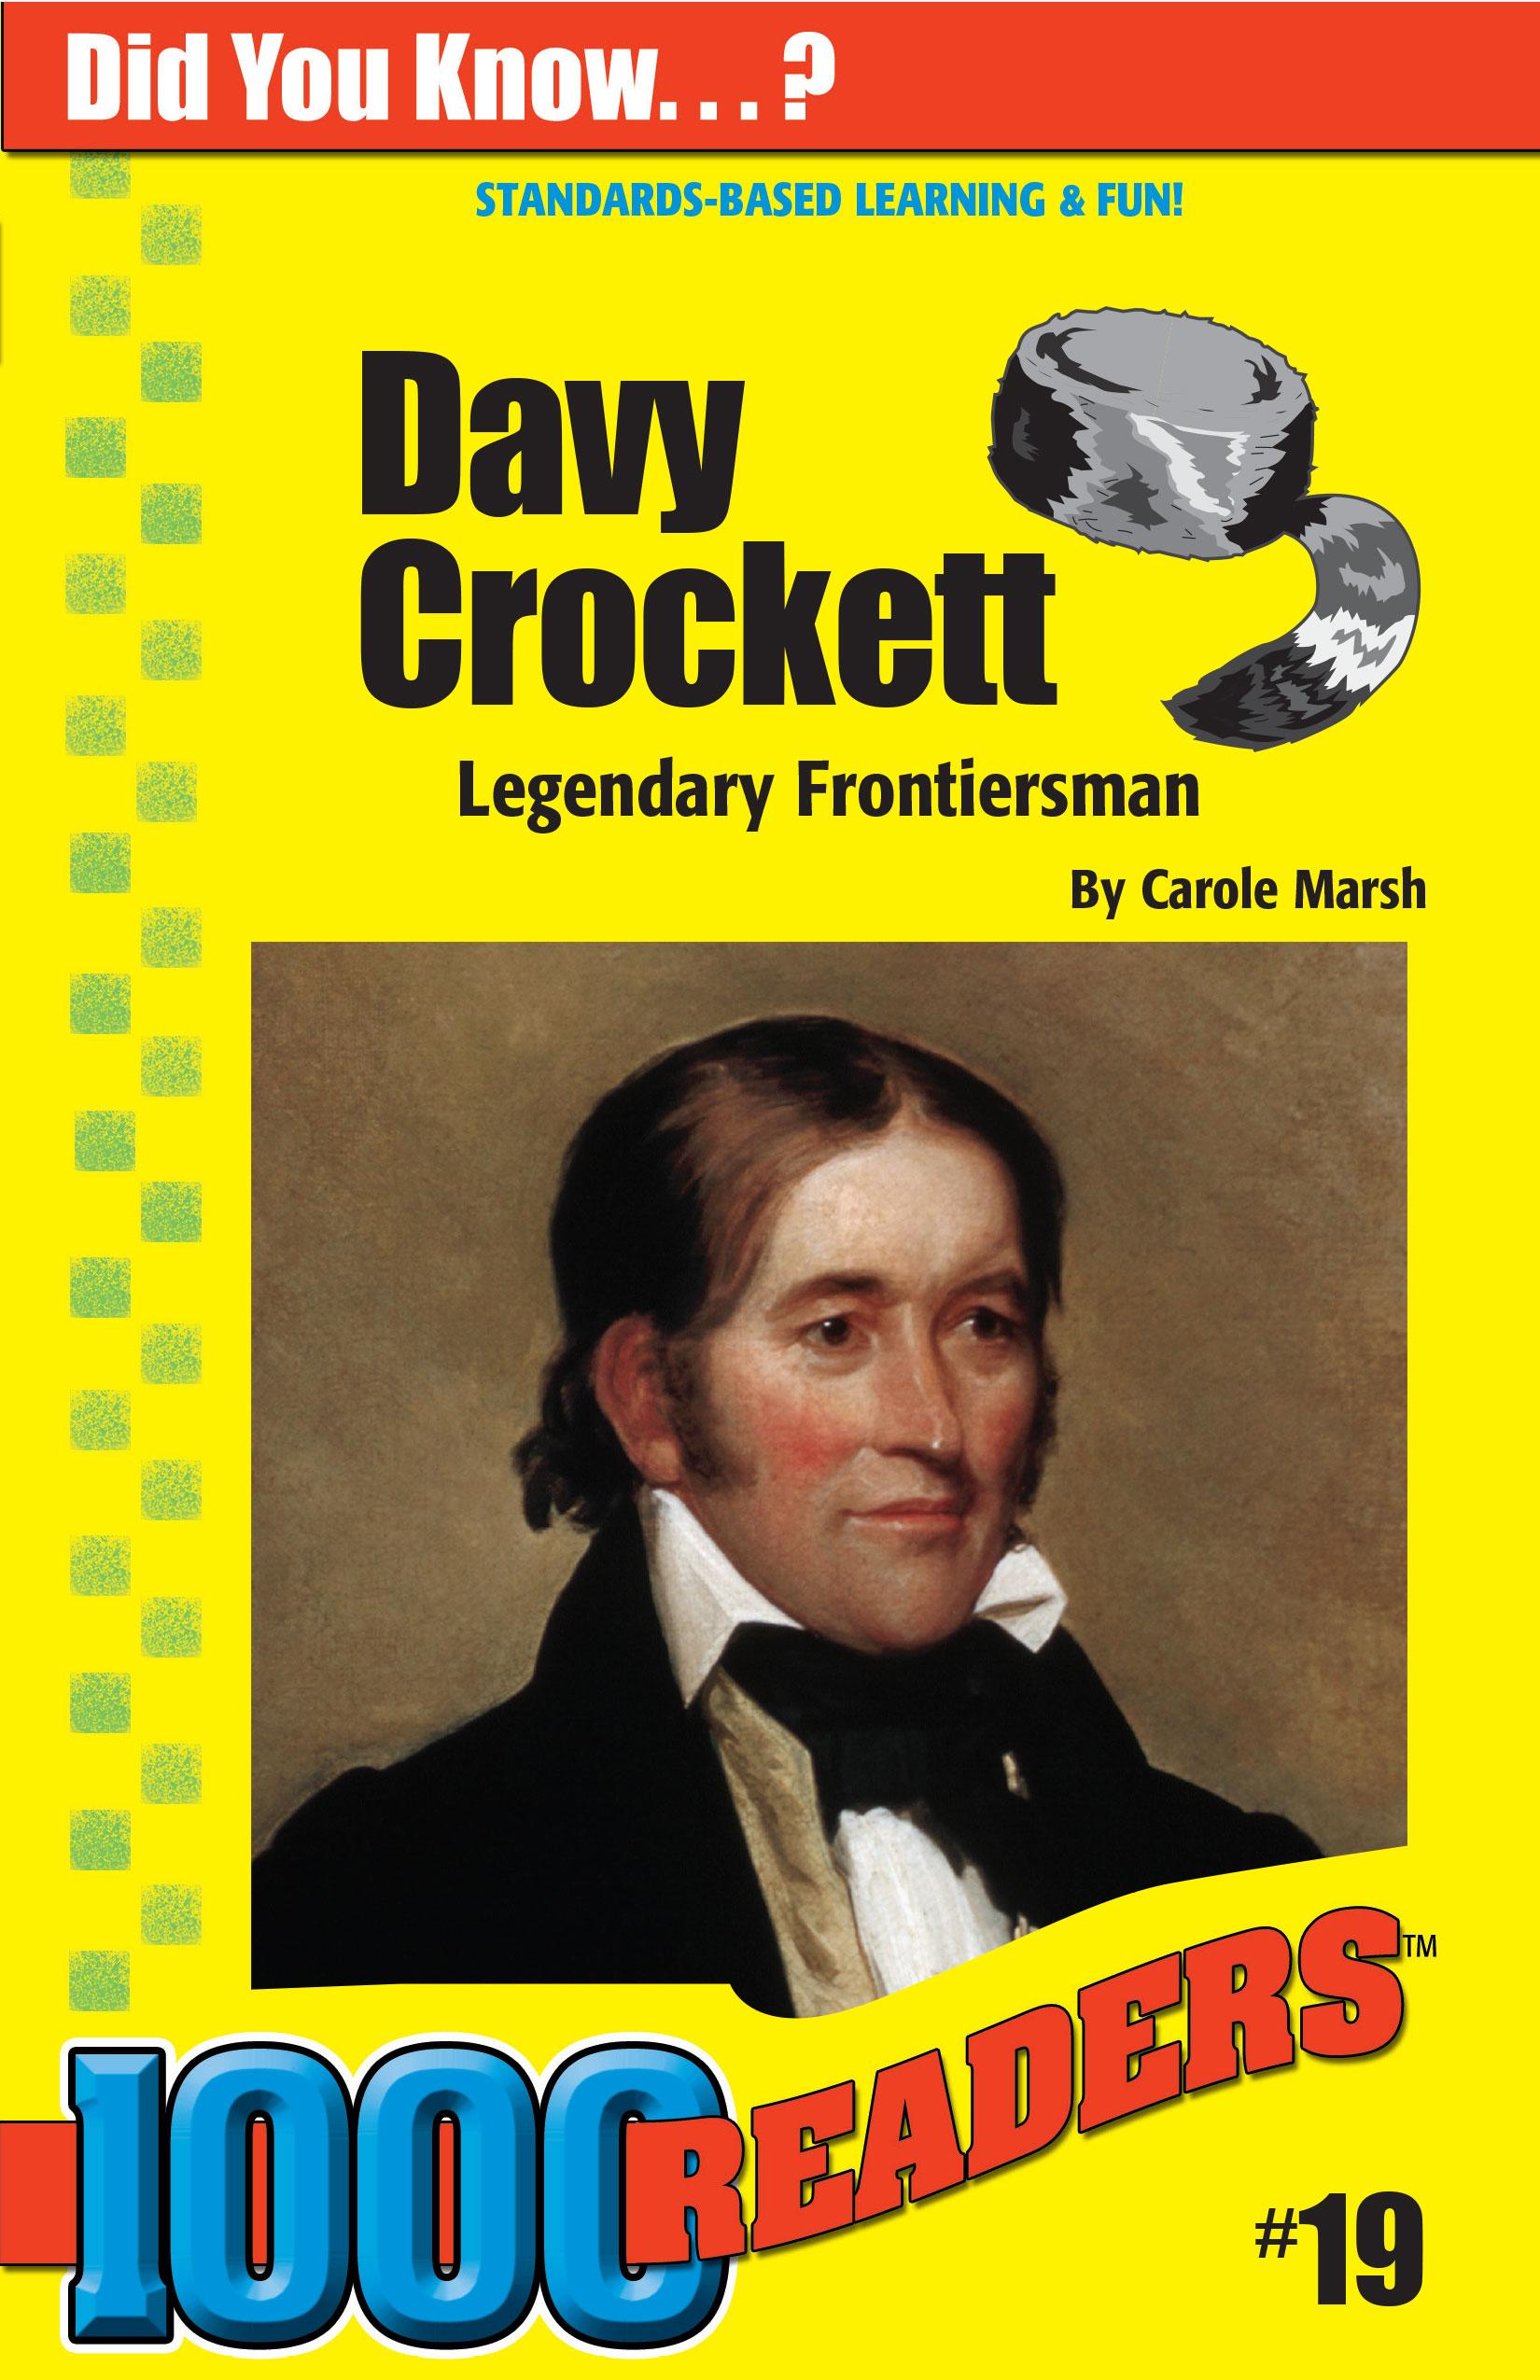 Davy Crockett: Legendary Frontiersman